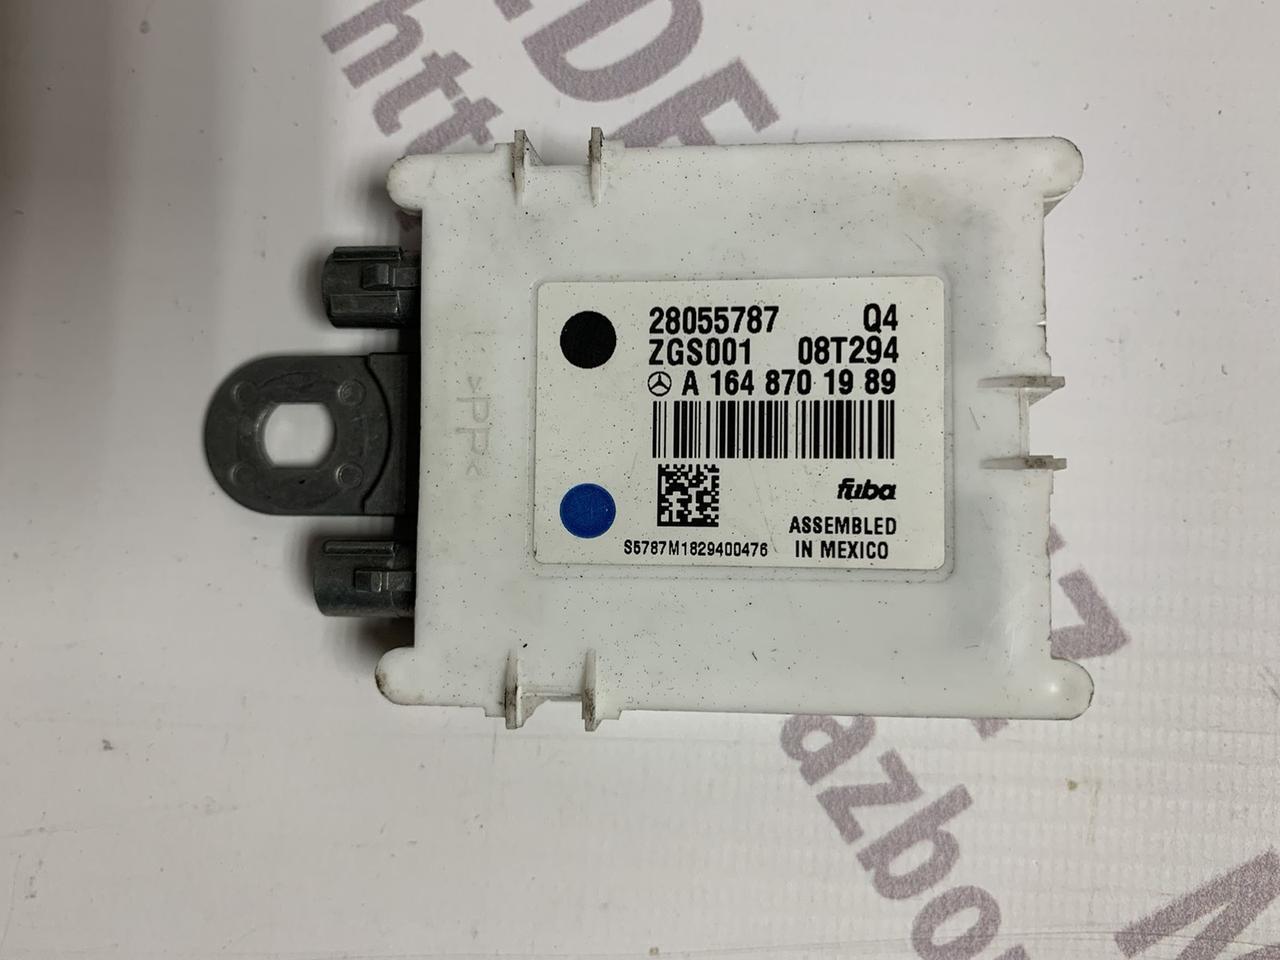 Підсилювач антени А1648201989 Mercedes ML W164 / GL X164 Мерседес мл гл 164